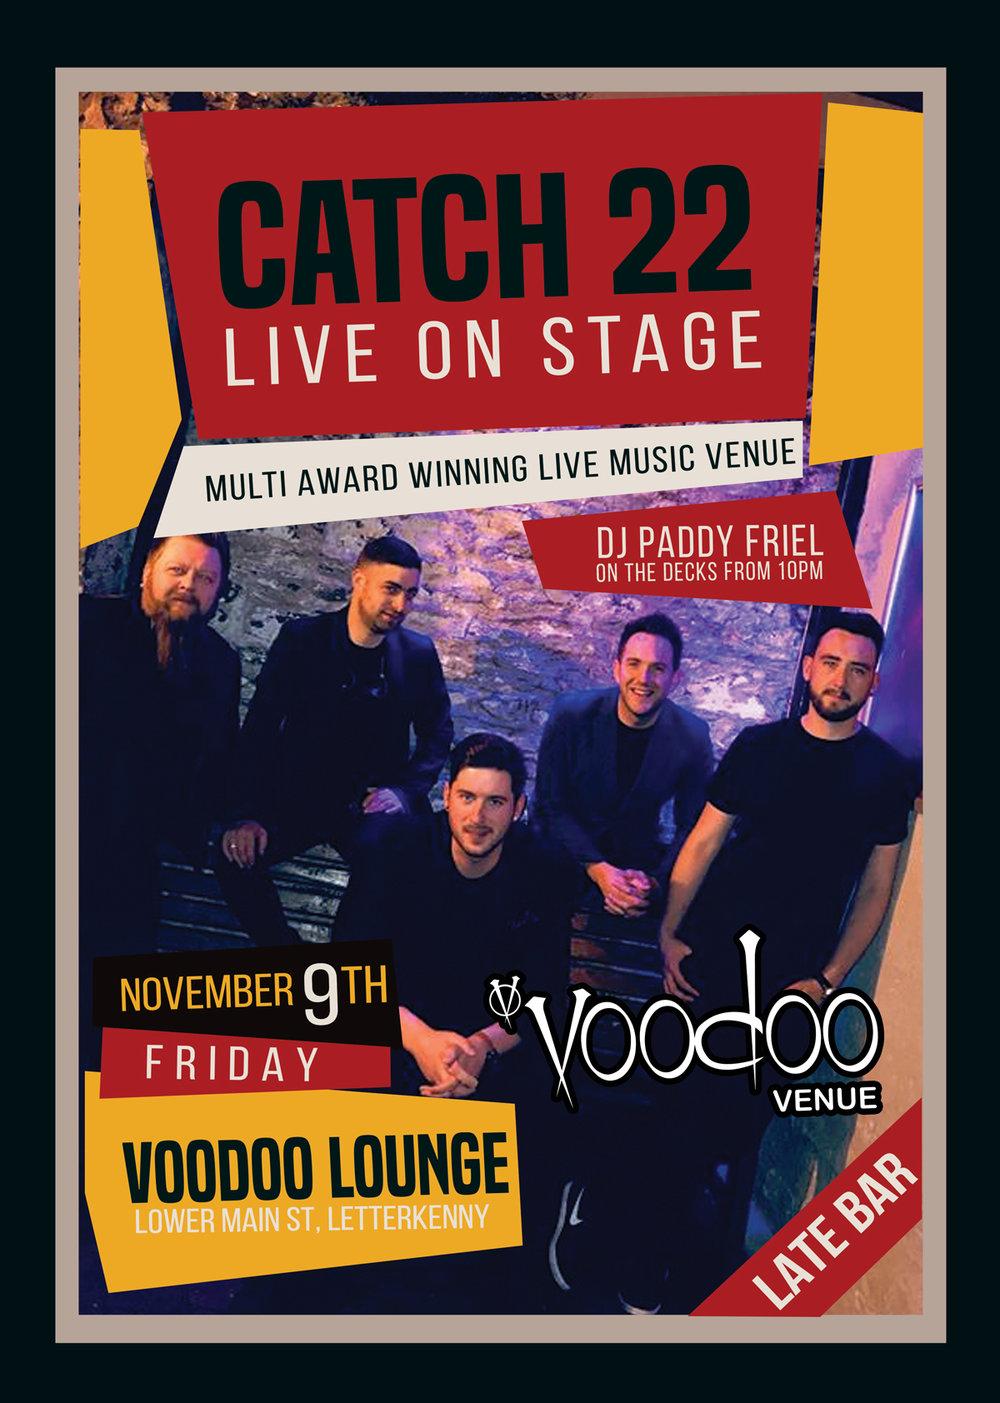 VOODOO-VENUE---catch-22-live-friday-nov-9-2018.jpg